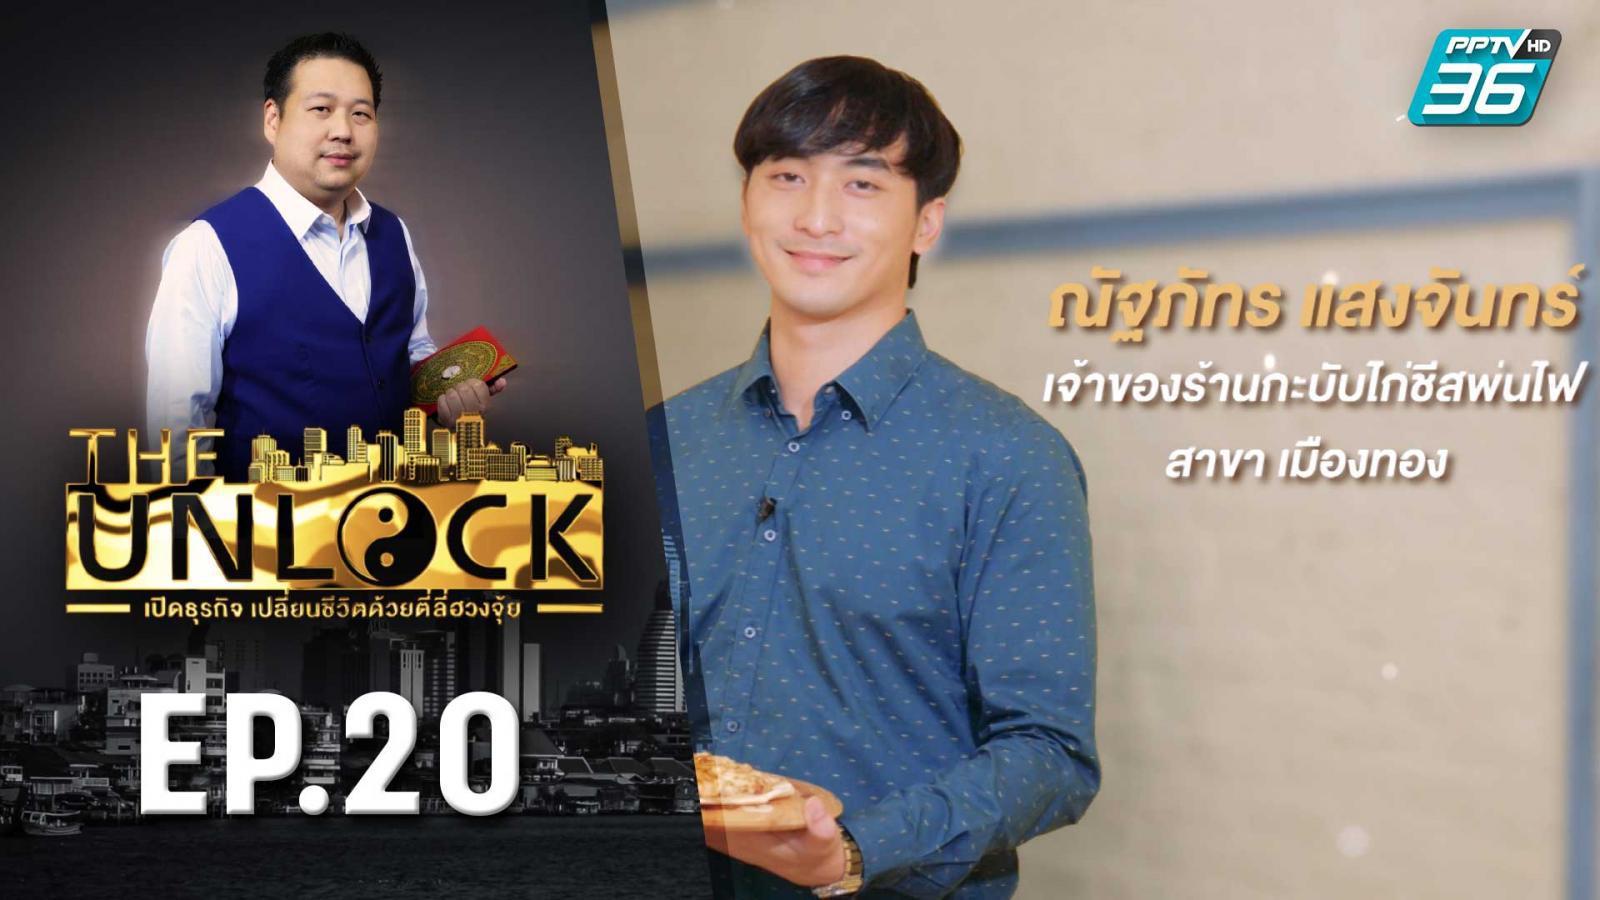 The Unlock เปิดธุรกิจ เปลี่ยนชีวิตด้วยตี่ลี่ฮวงจุ้ย | ร้านกะบับไก่ชีสพ่นไฟ EP.20 | PPTVHD 36